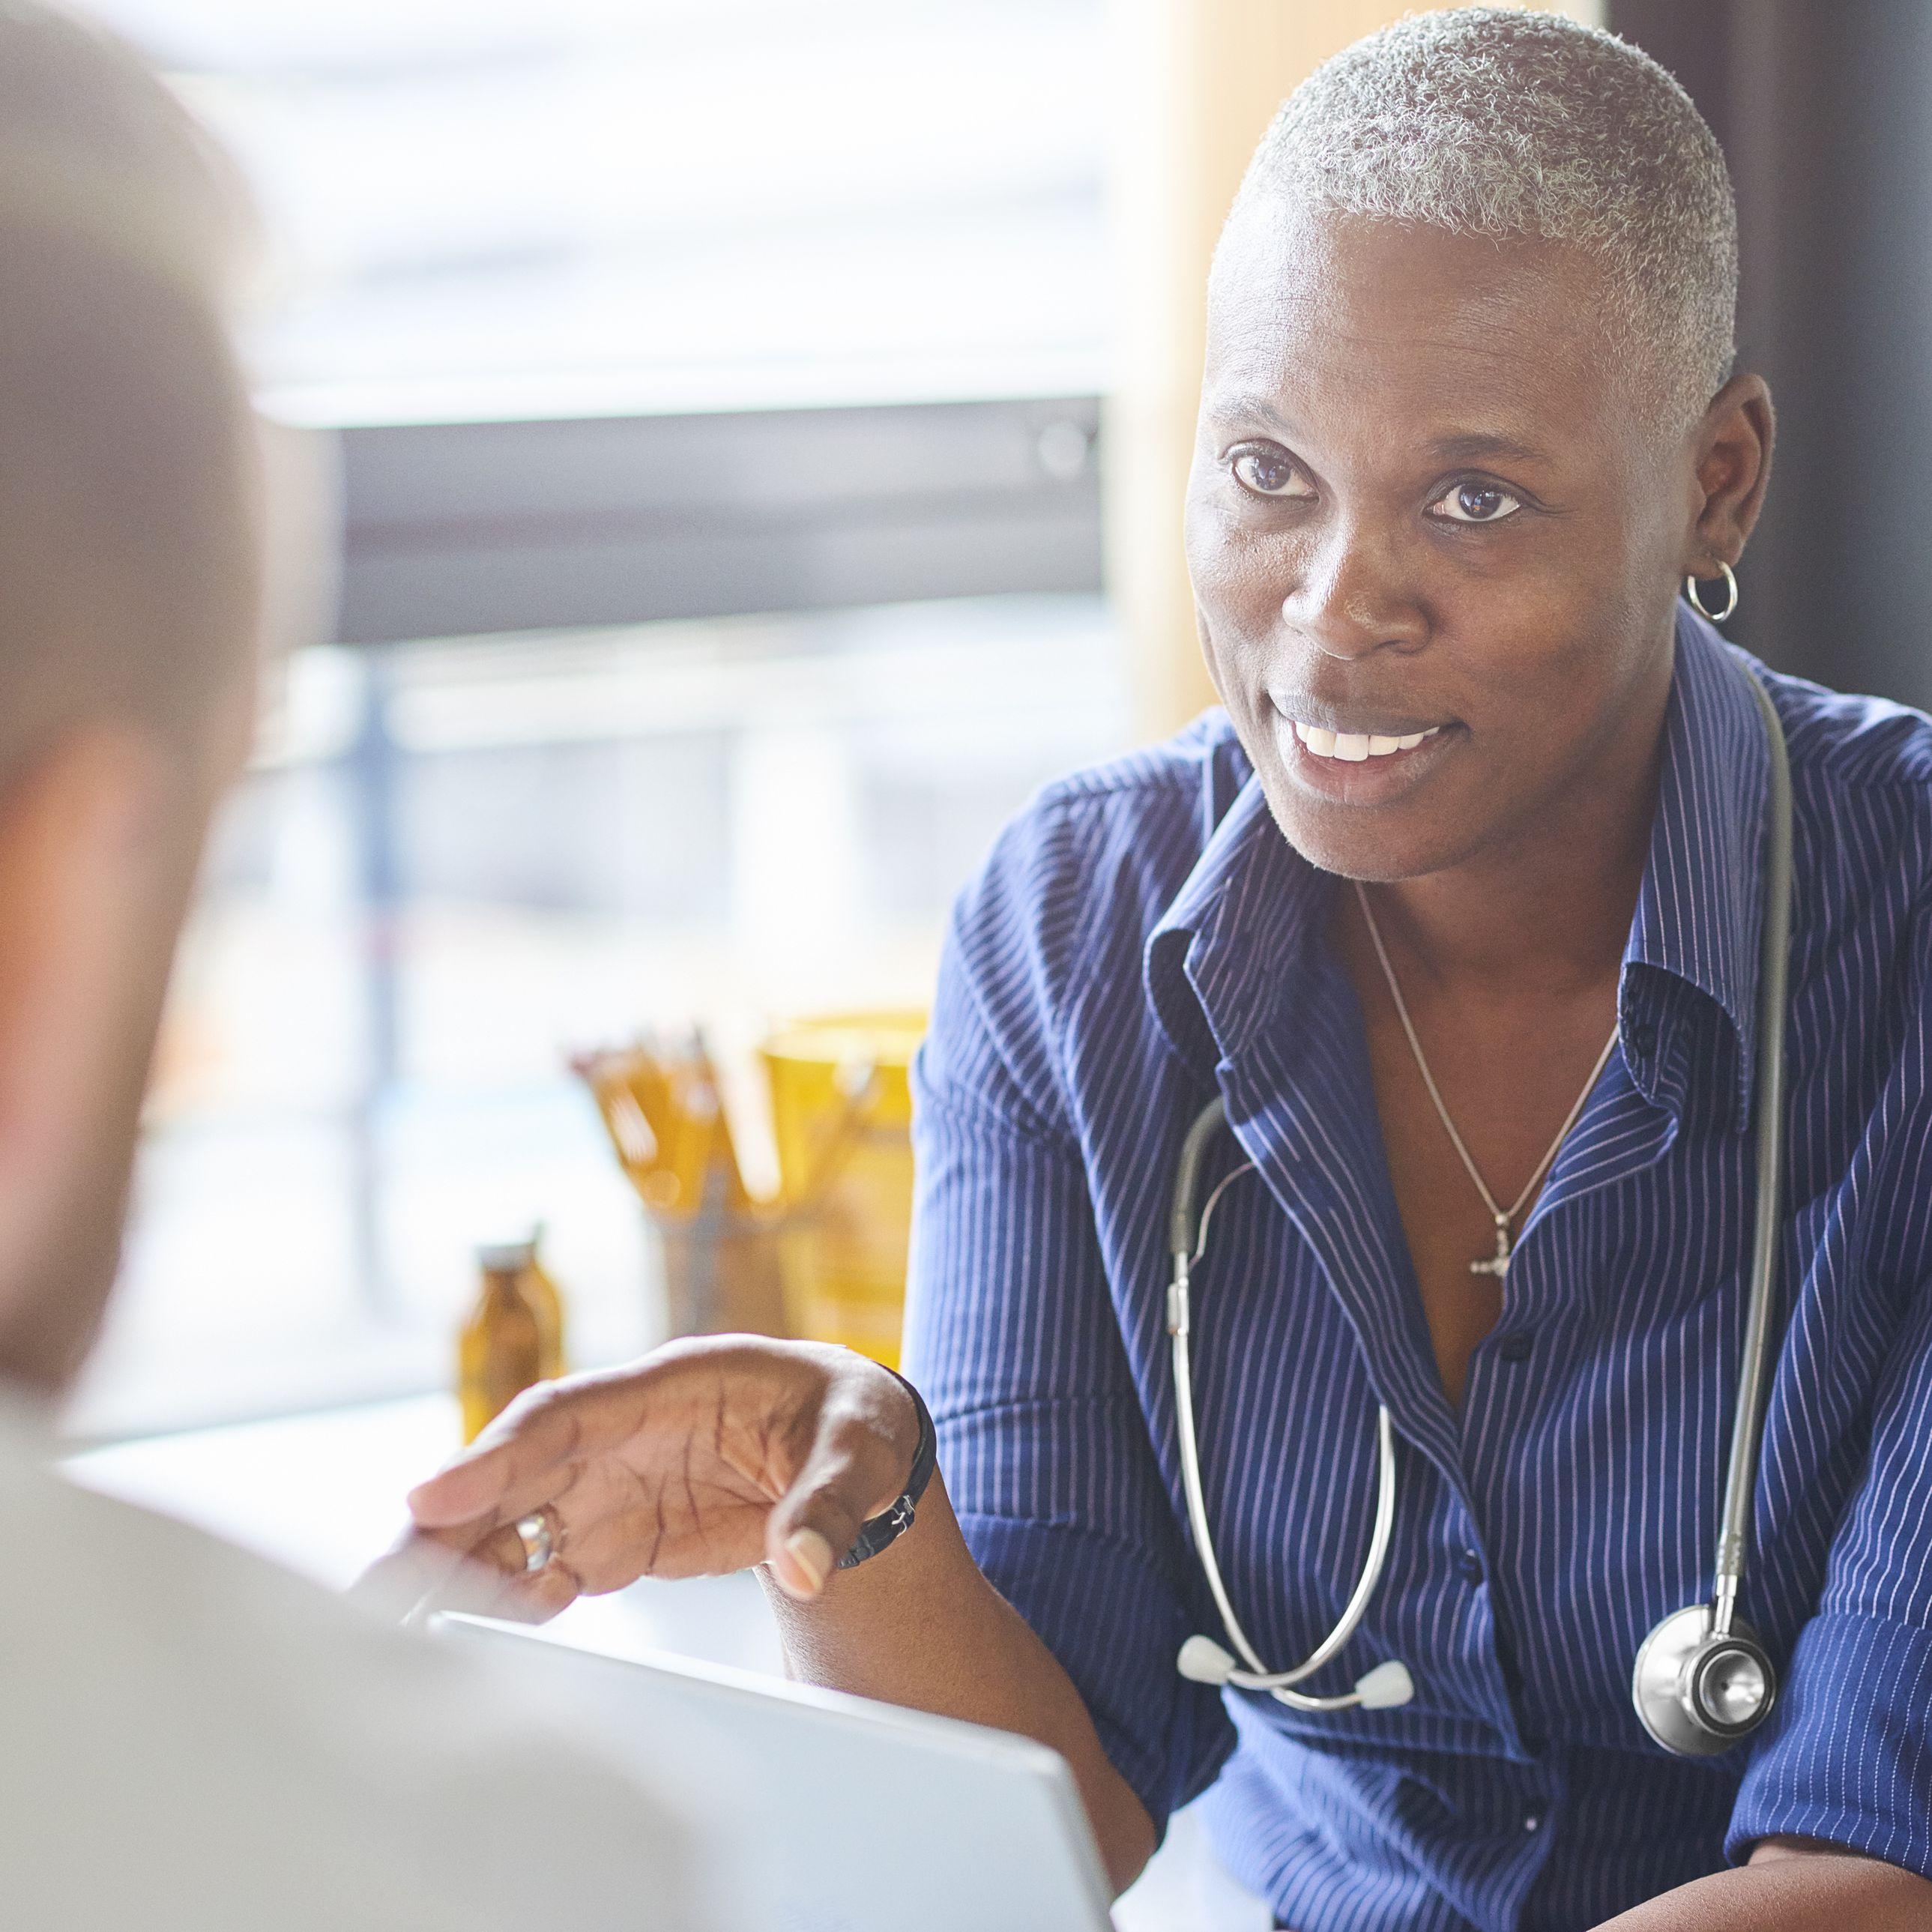 The Verbal Fluency Test for Dementia Screening